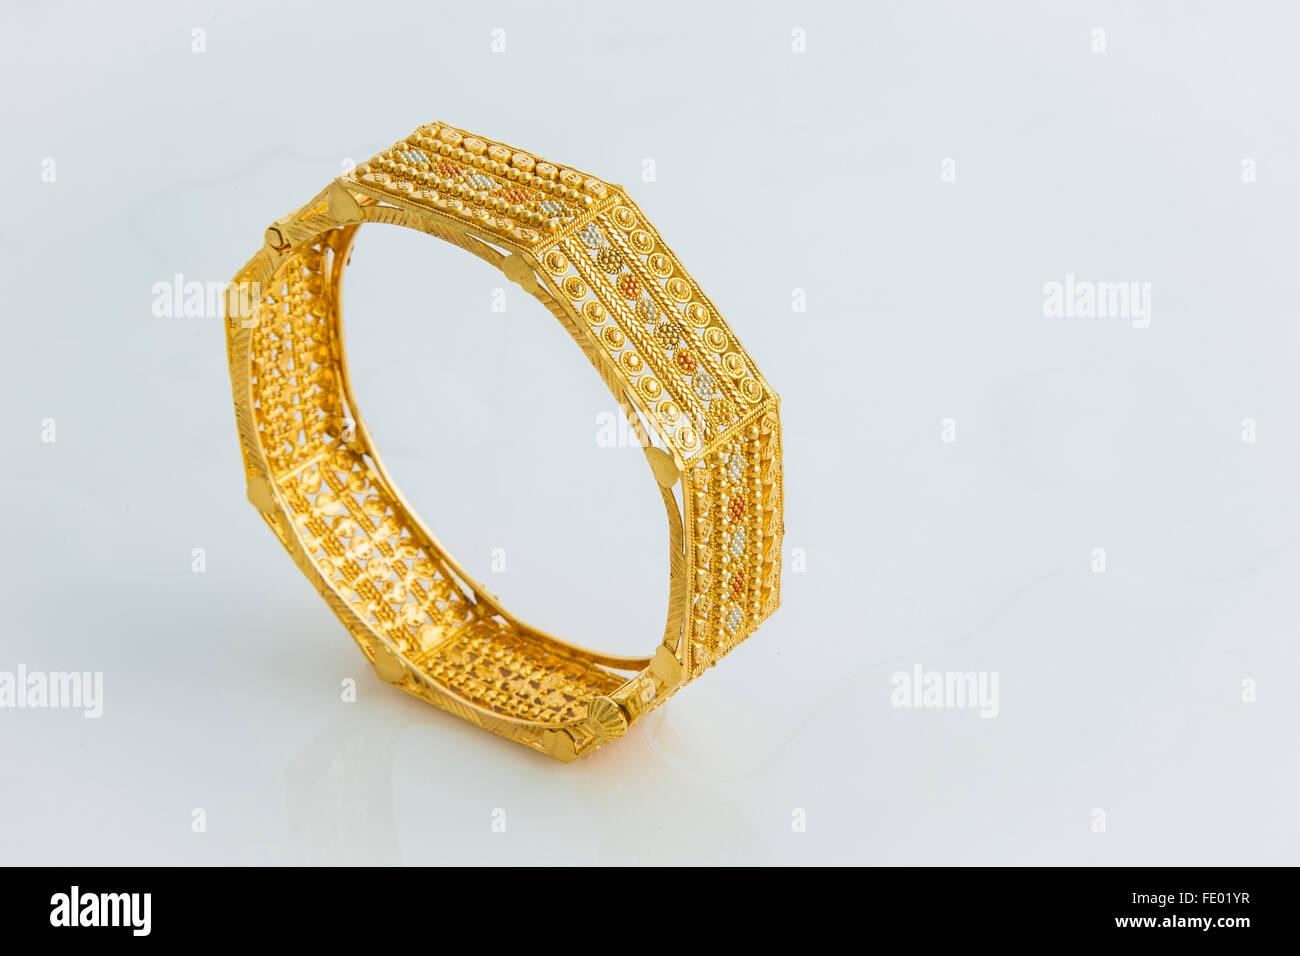 Indian Gold Bangles Stock Photos & Indian Gold Bangles Stock Images ...